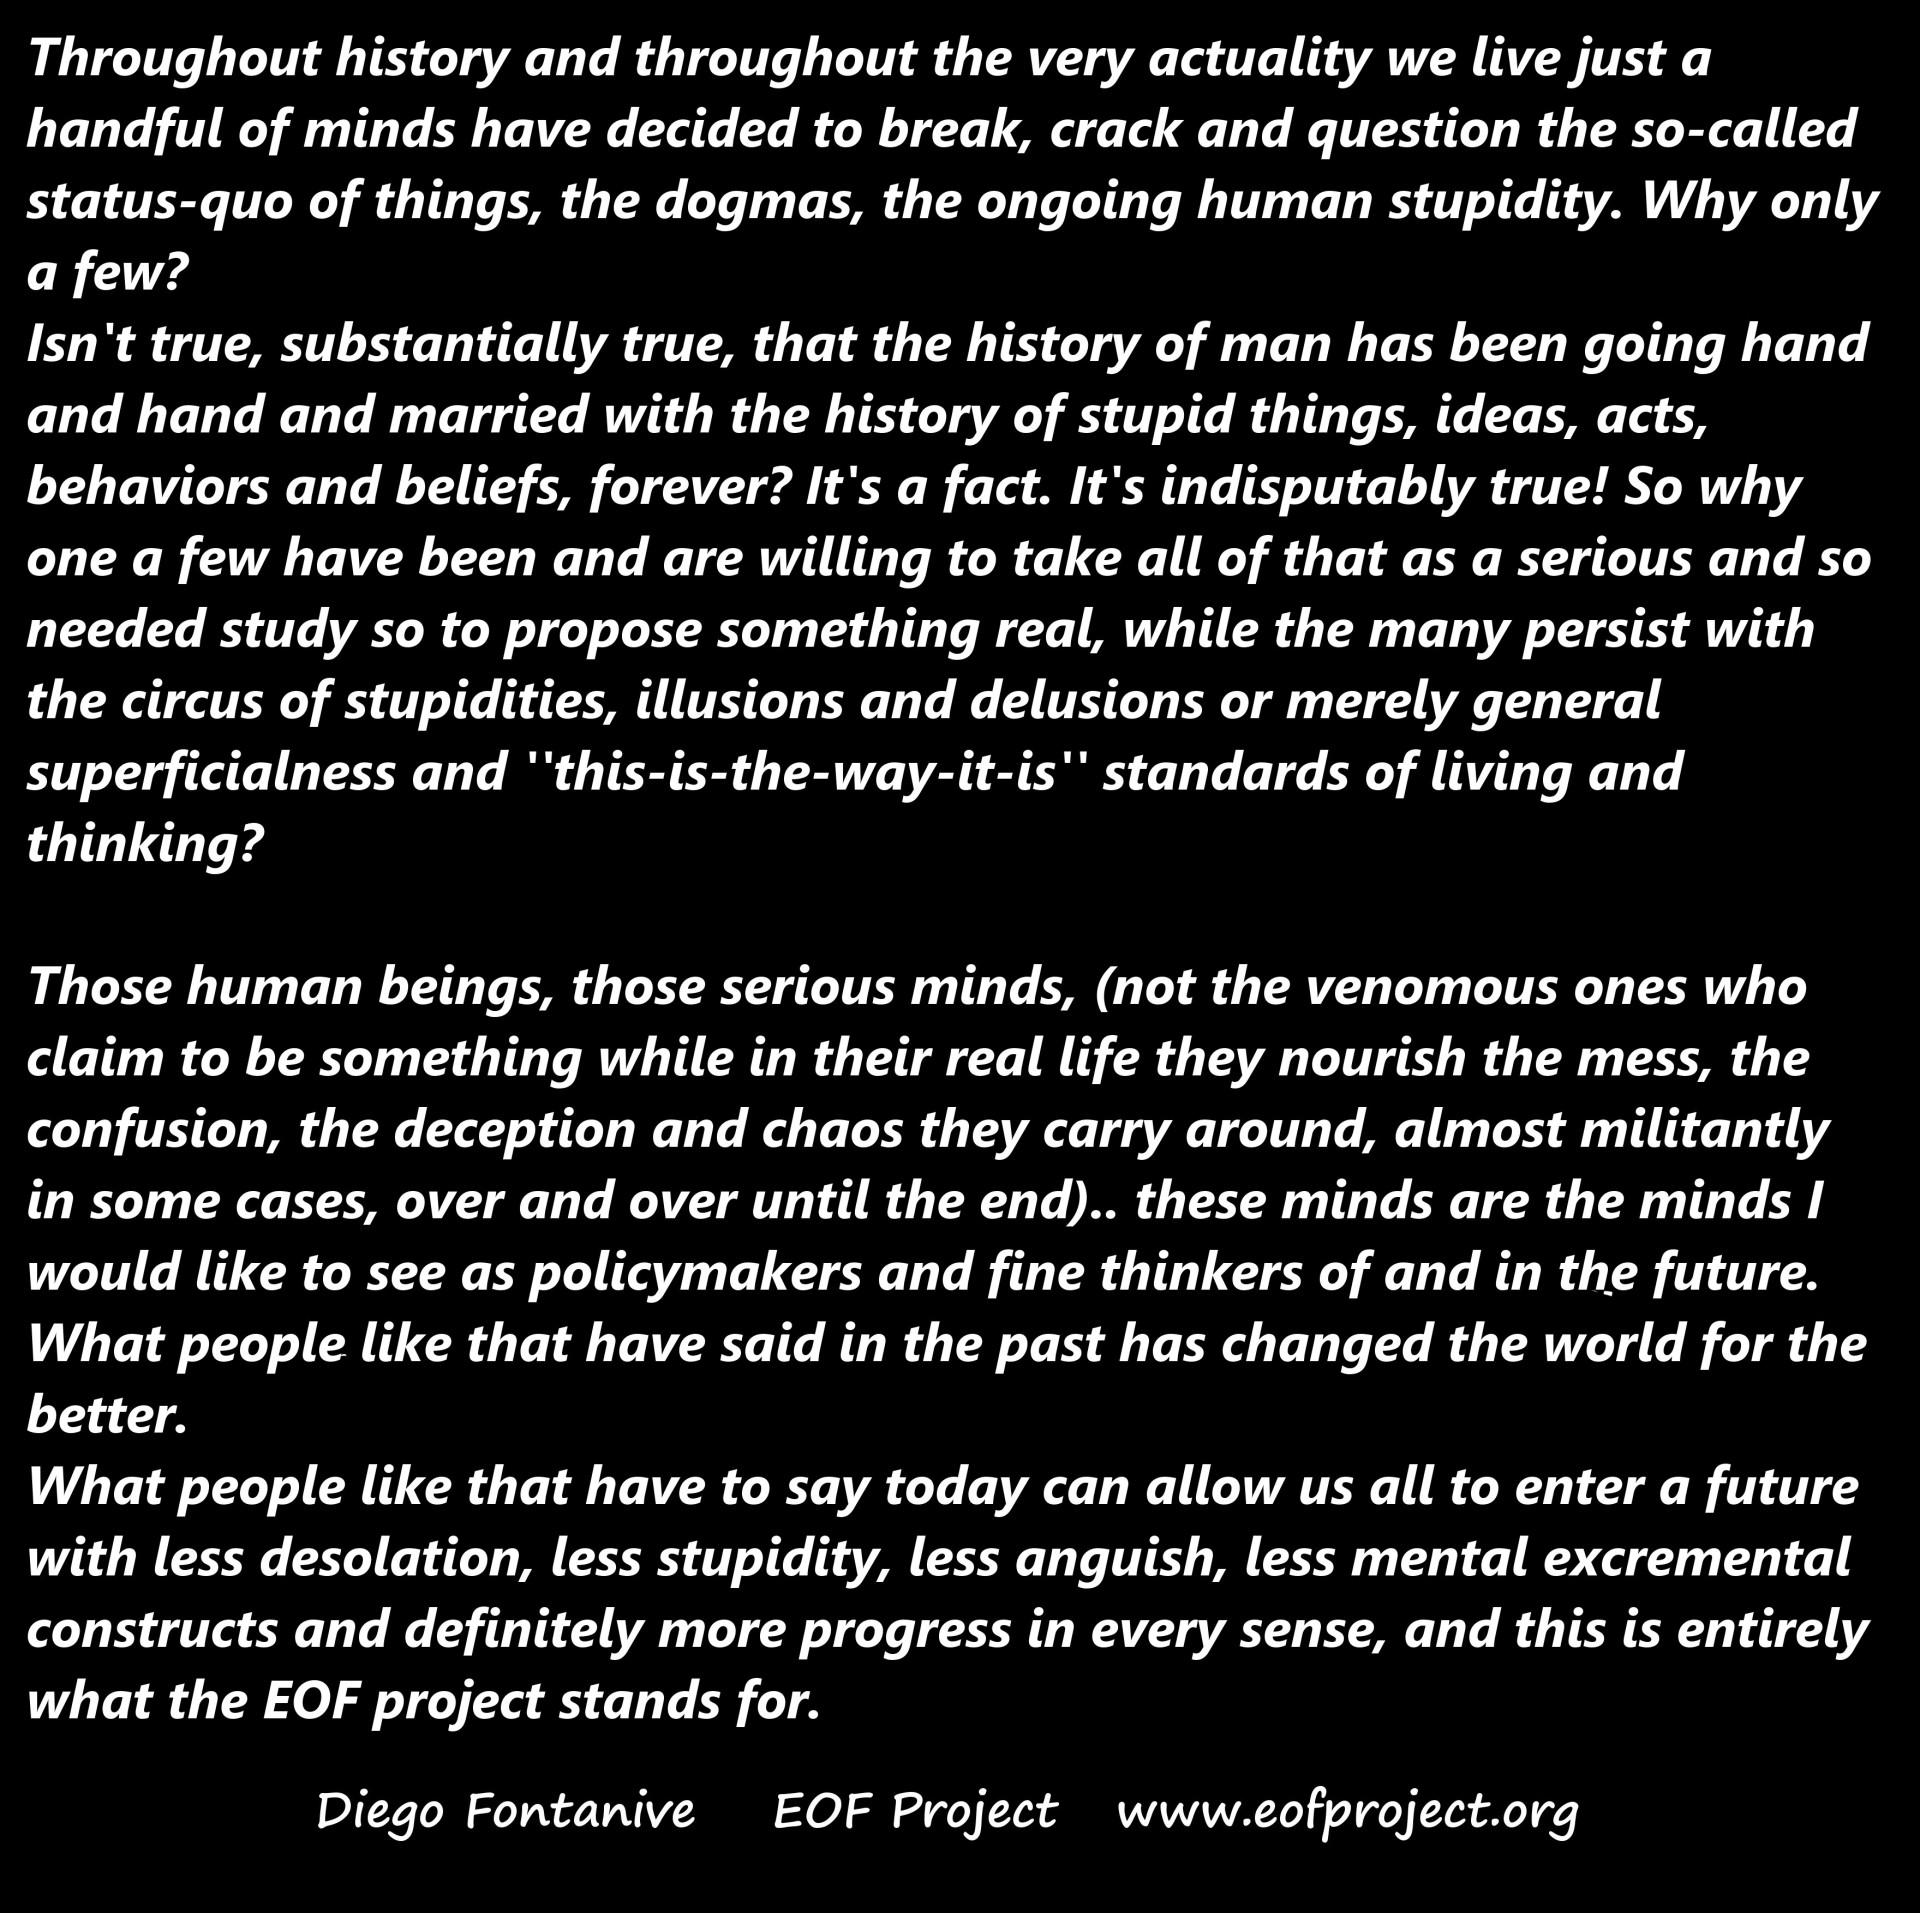 Human History, History of stupidity And Future